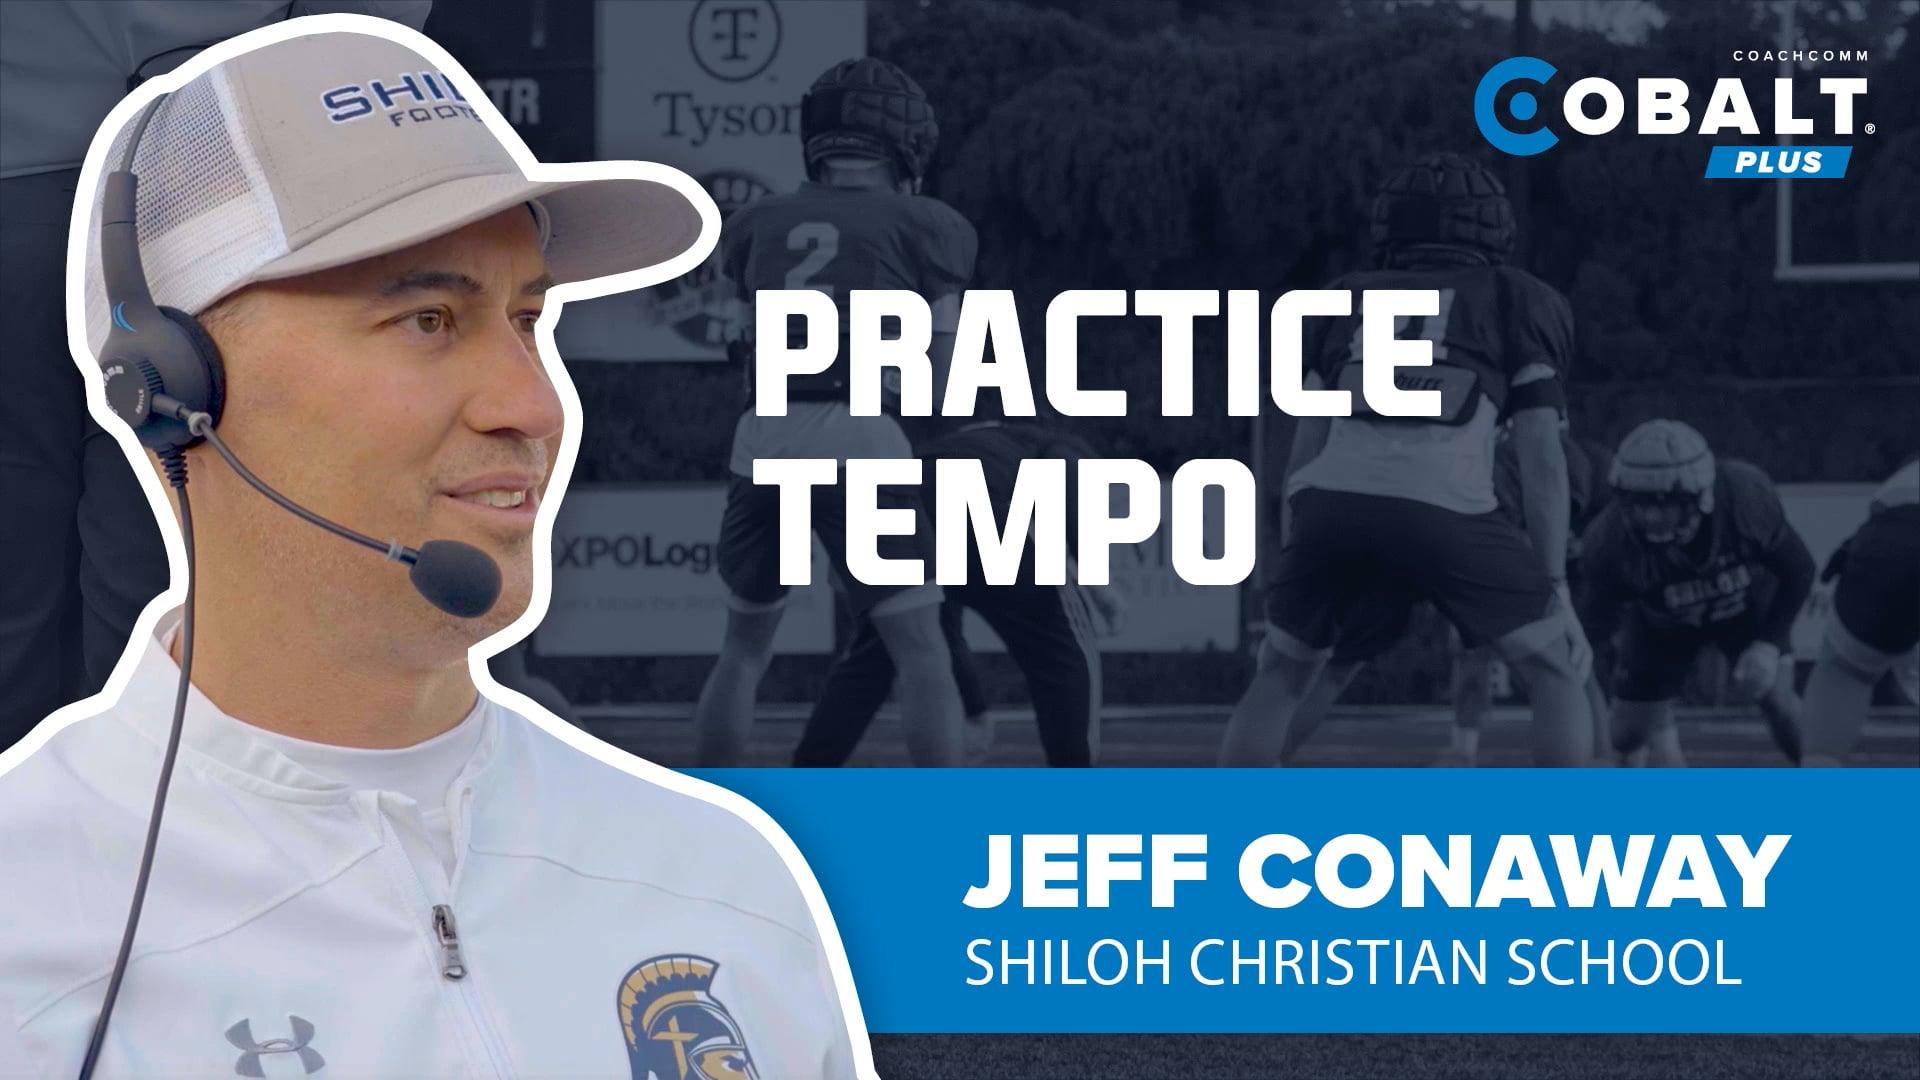 Cobalt PLUS improves the tempo of practice